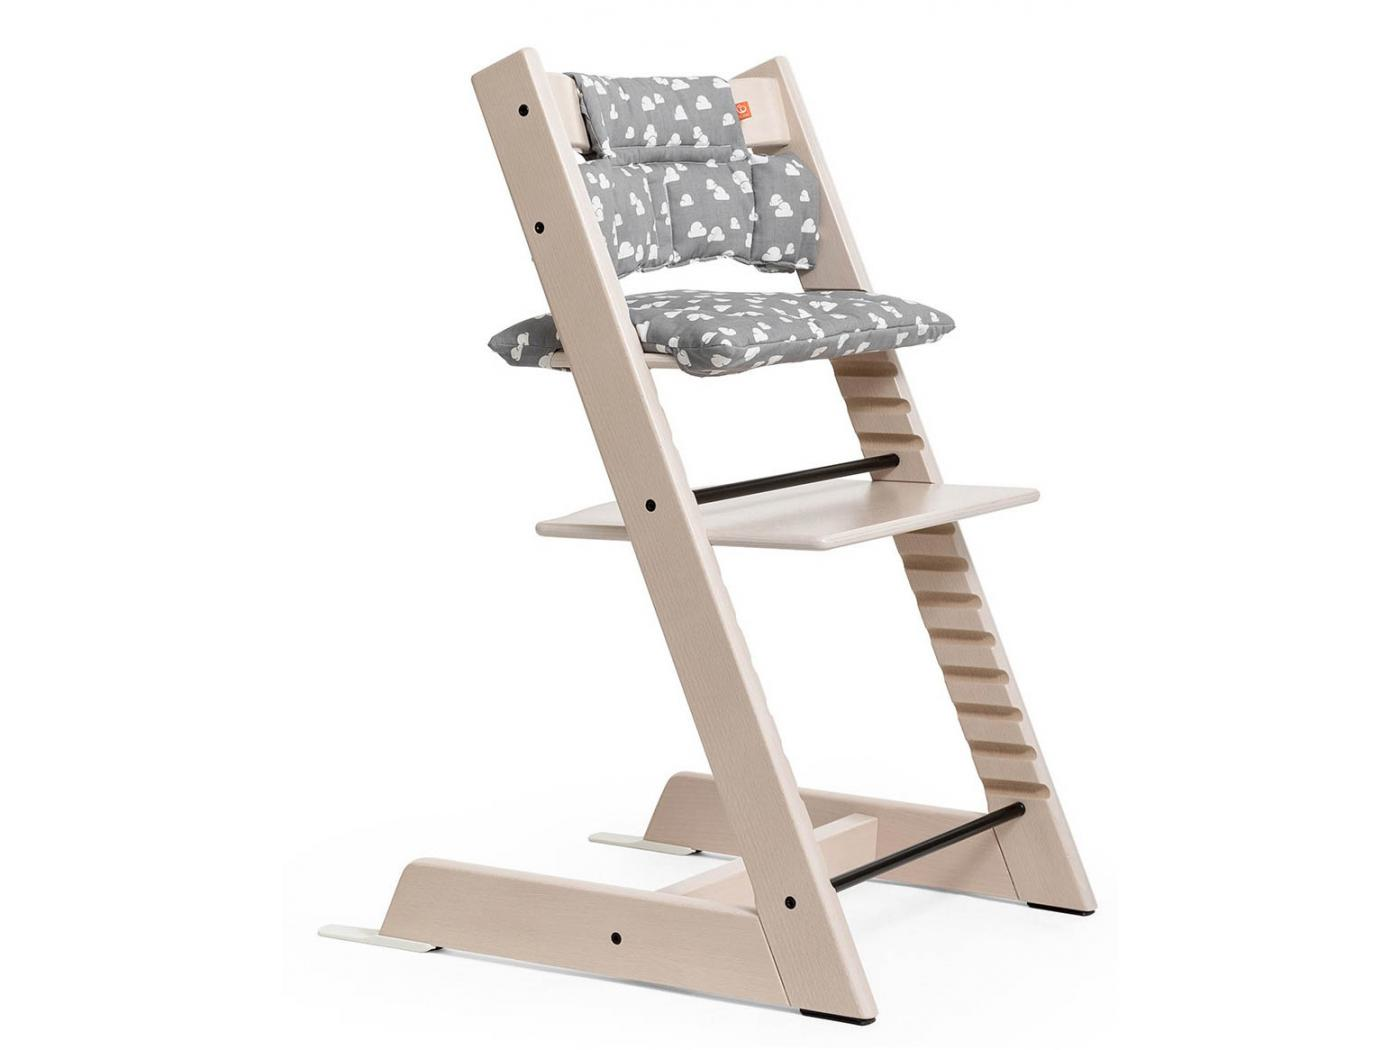 Stokke - Chaise haute Tripp Trapp Blanchi - Personnalisable